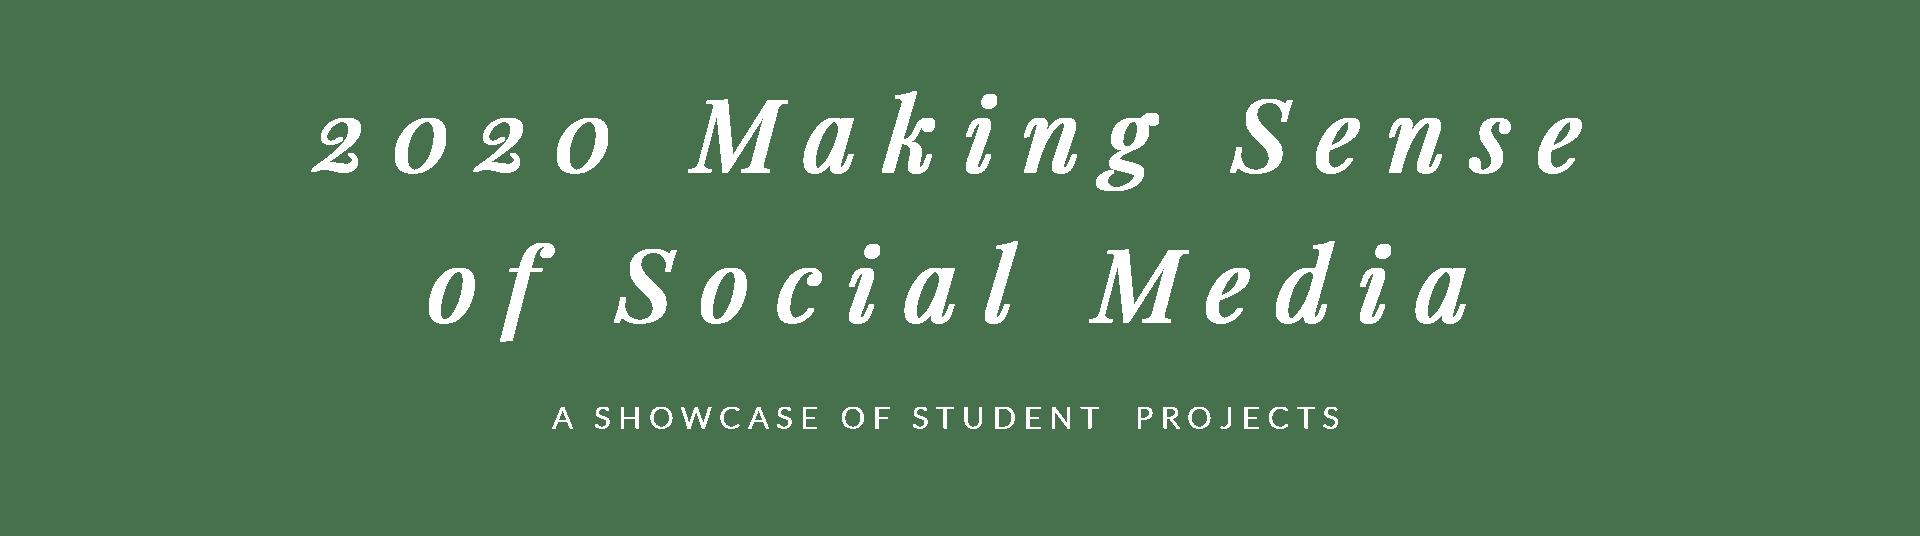 2020 Making Sense of Social Media